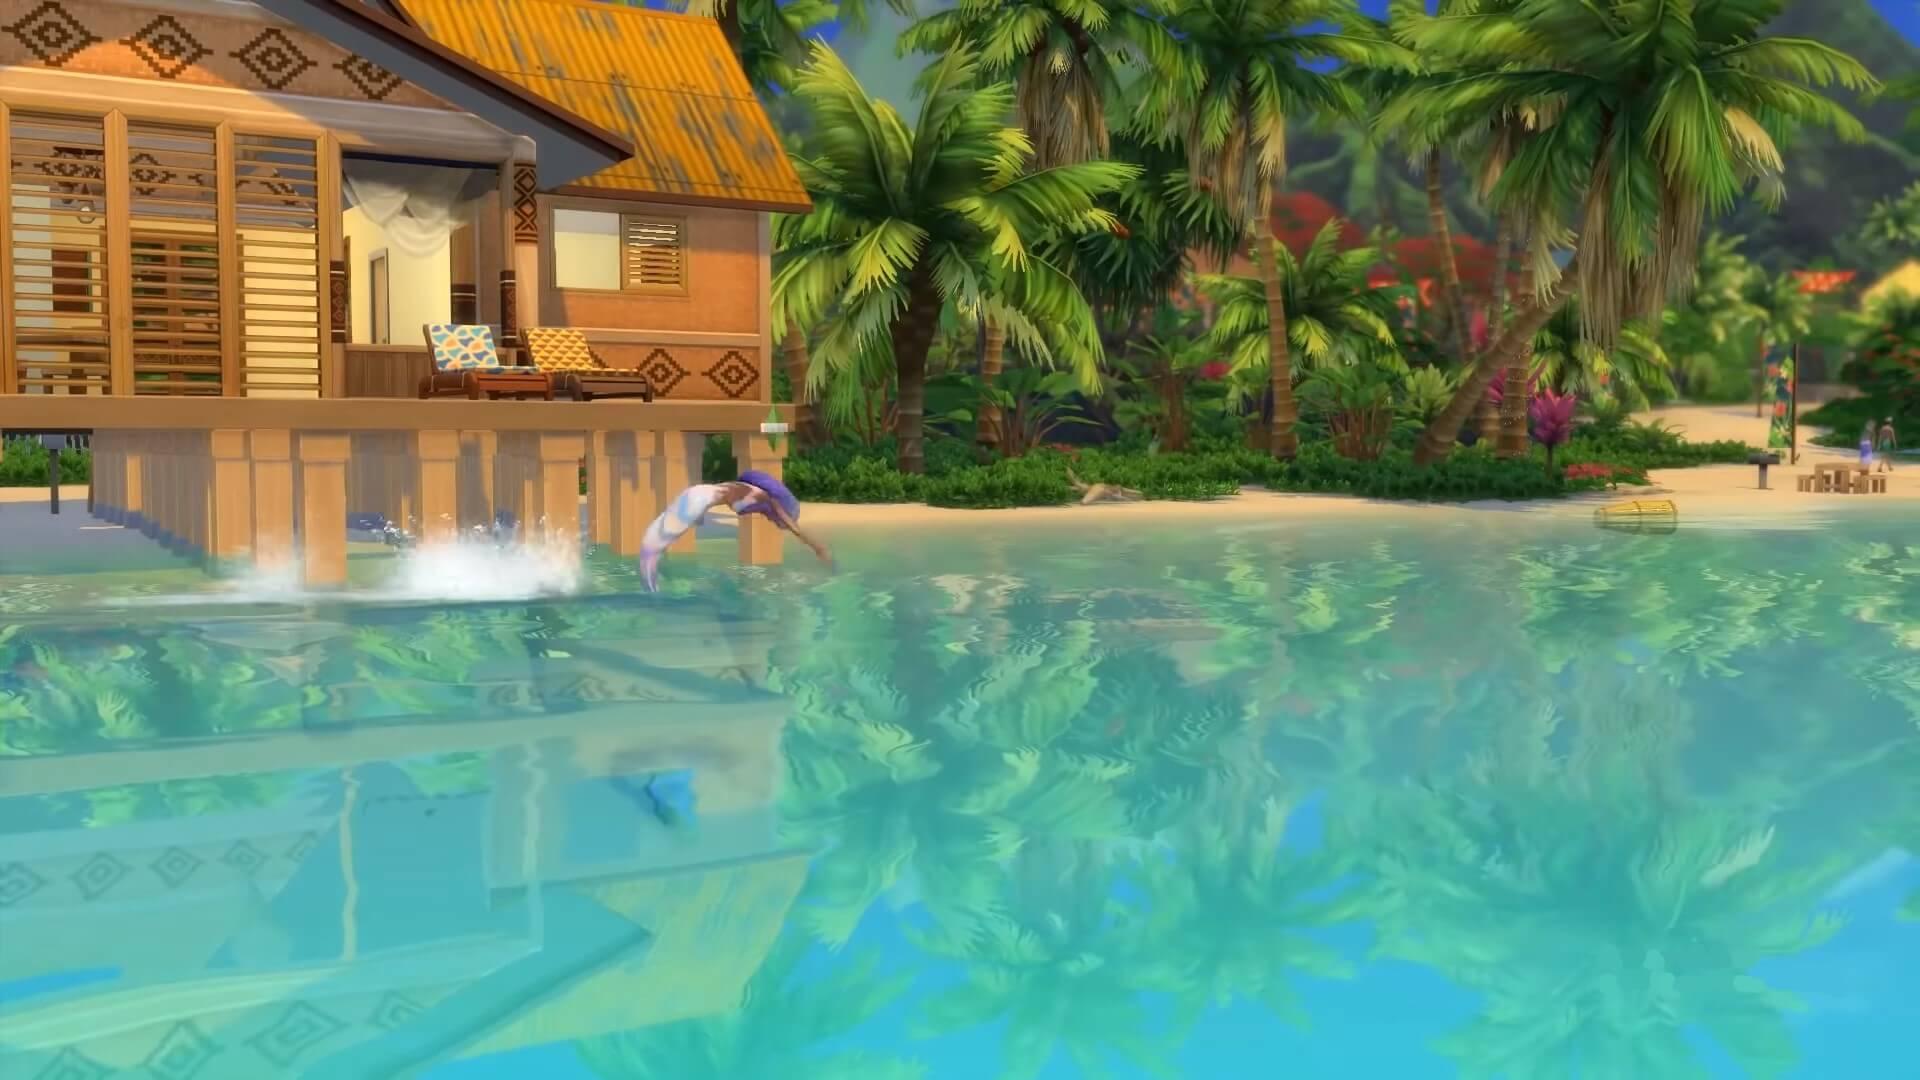 The Sims 4 Mermaid